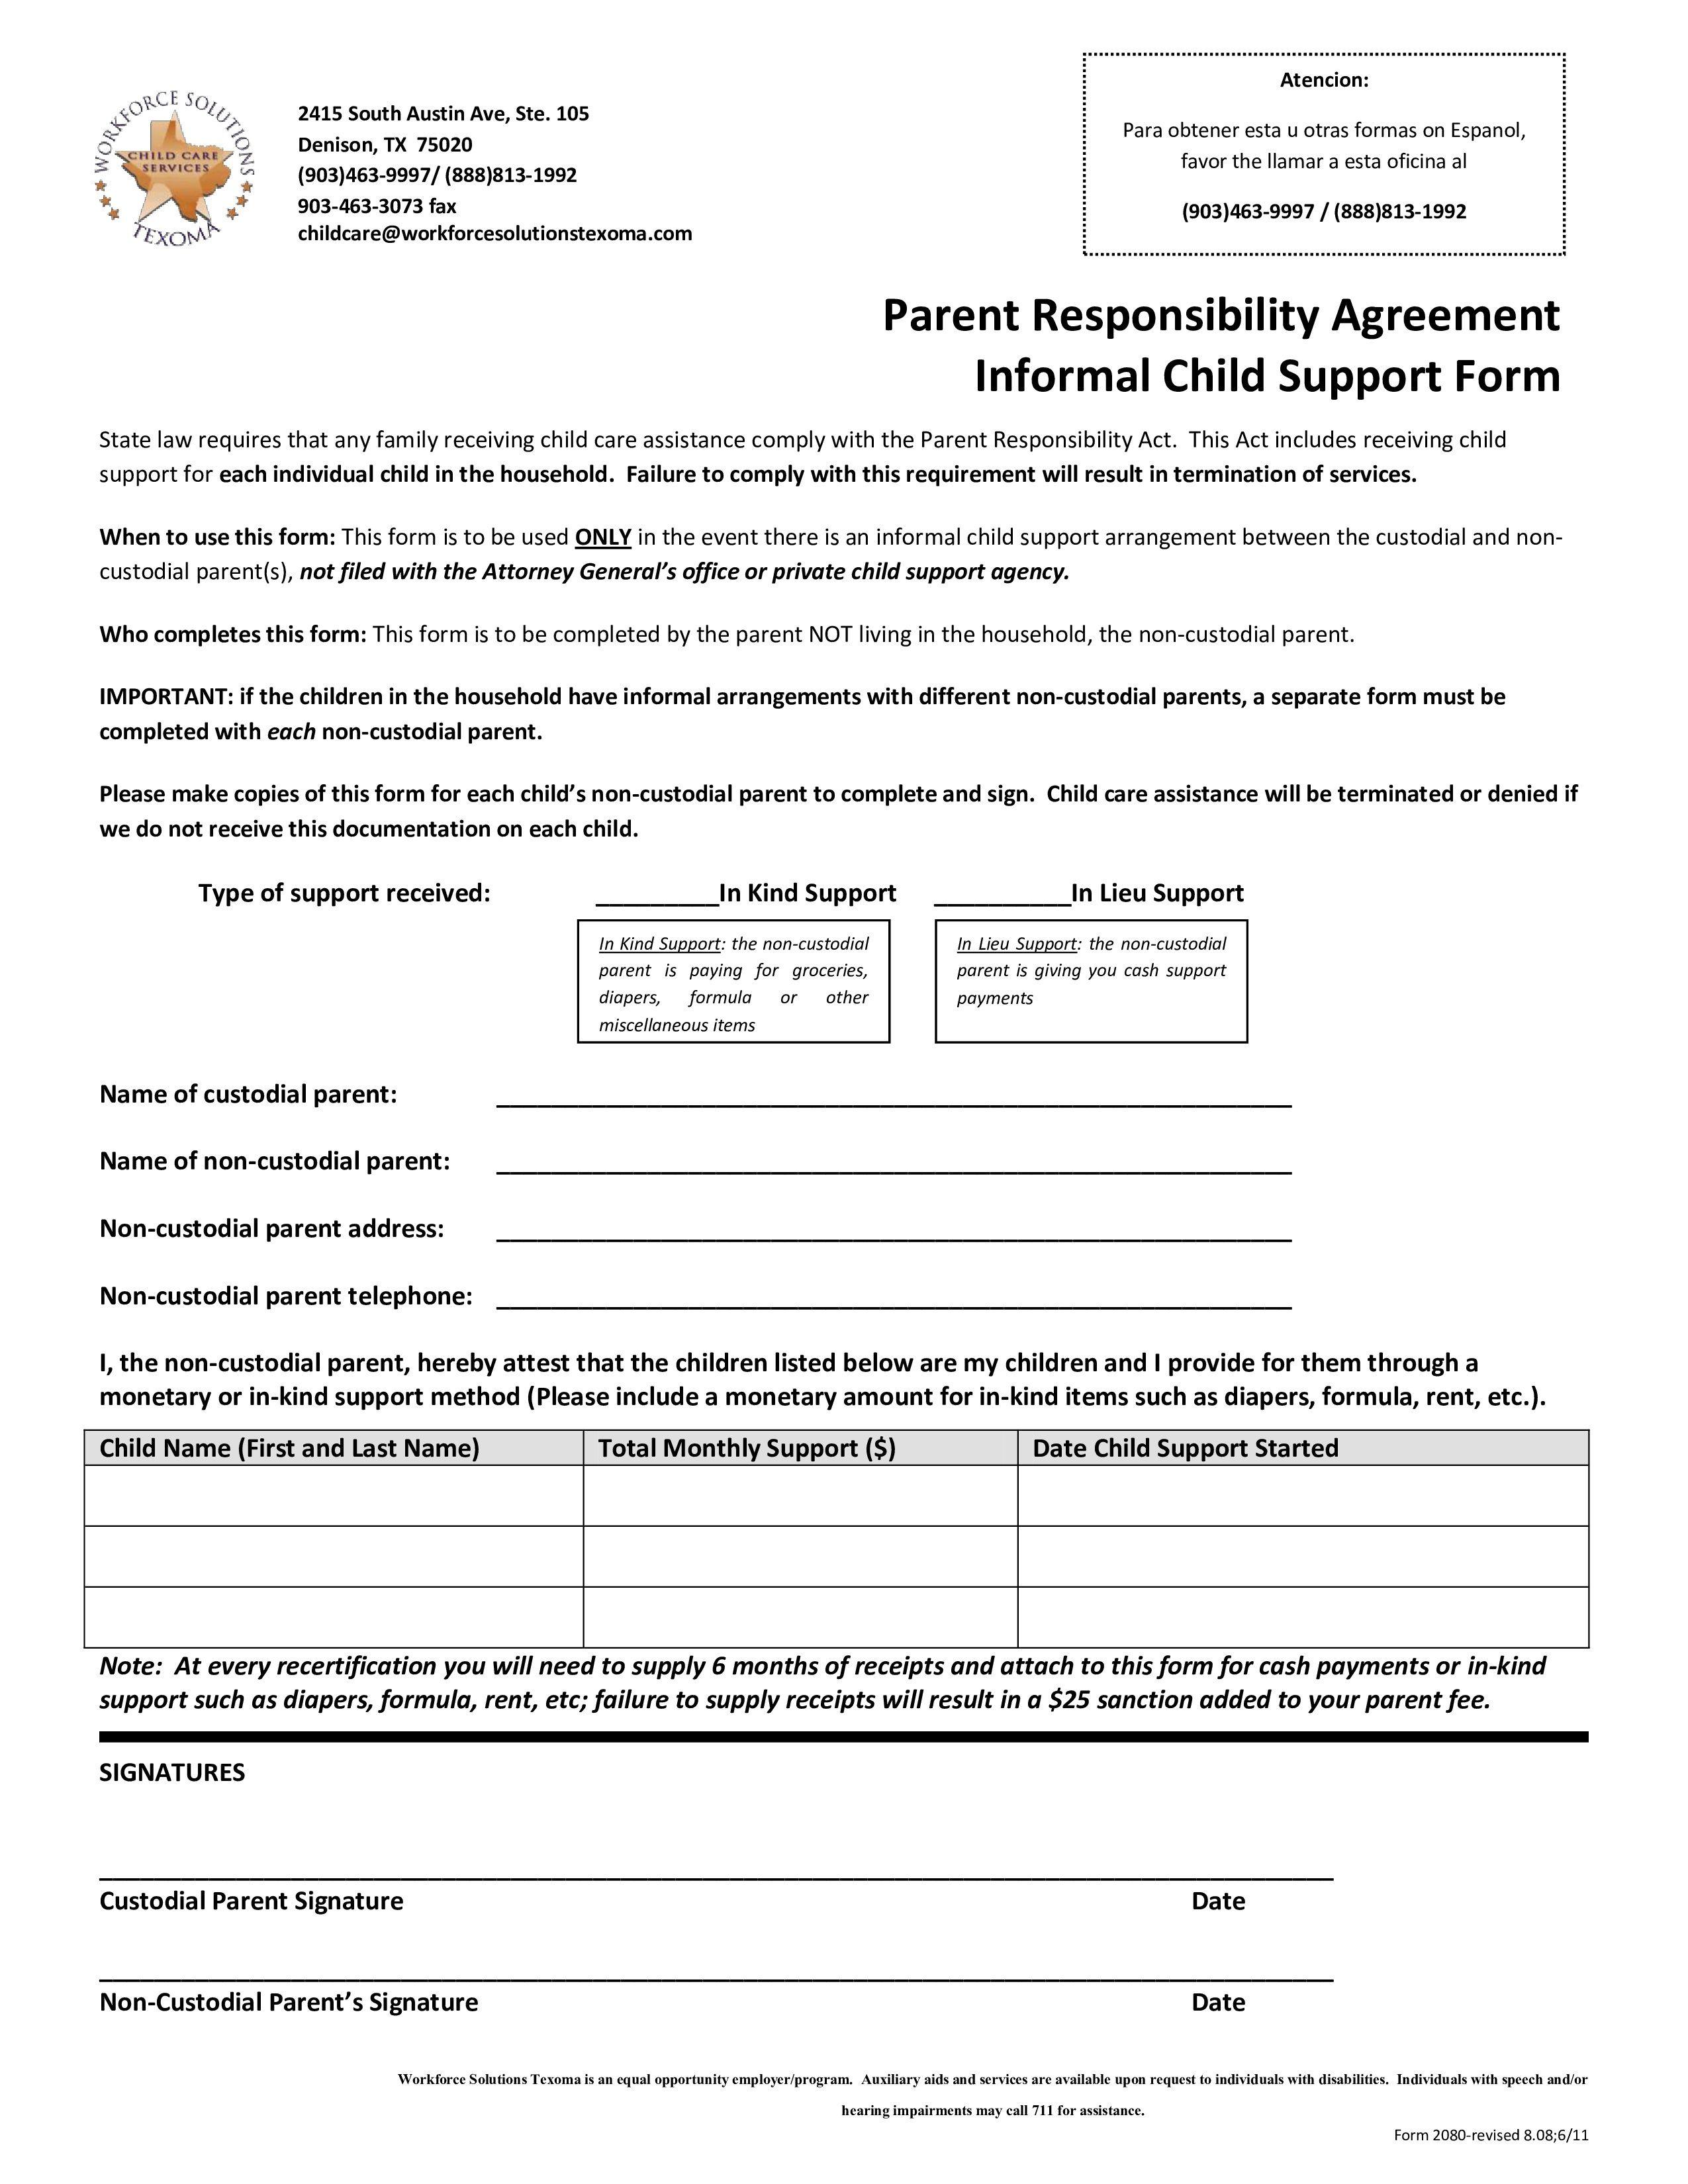 003 Striking Child Support Agreement Template Concept  Australia Bc AlbertaFull